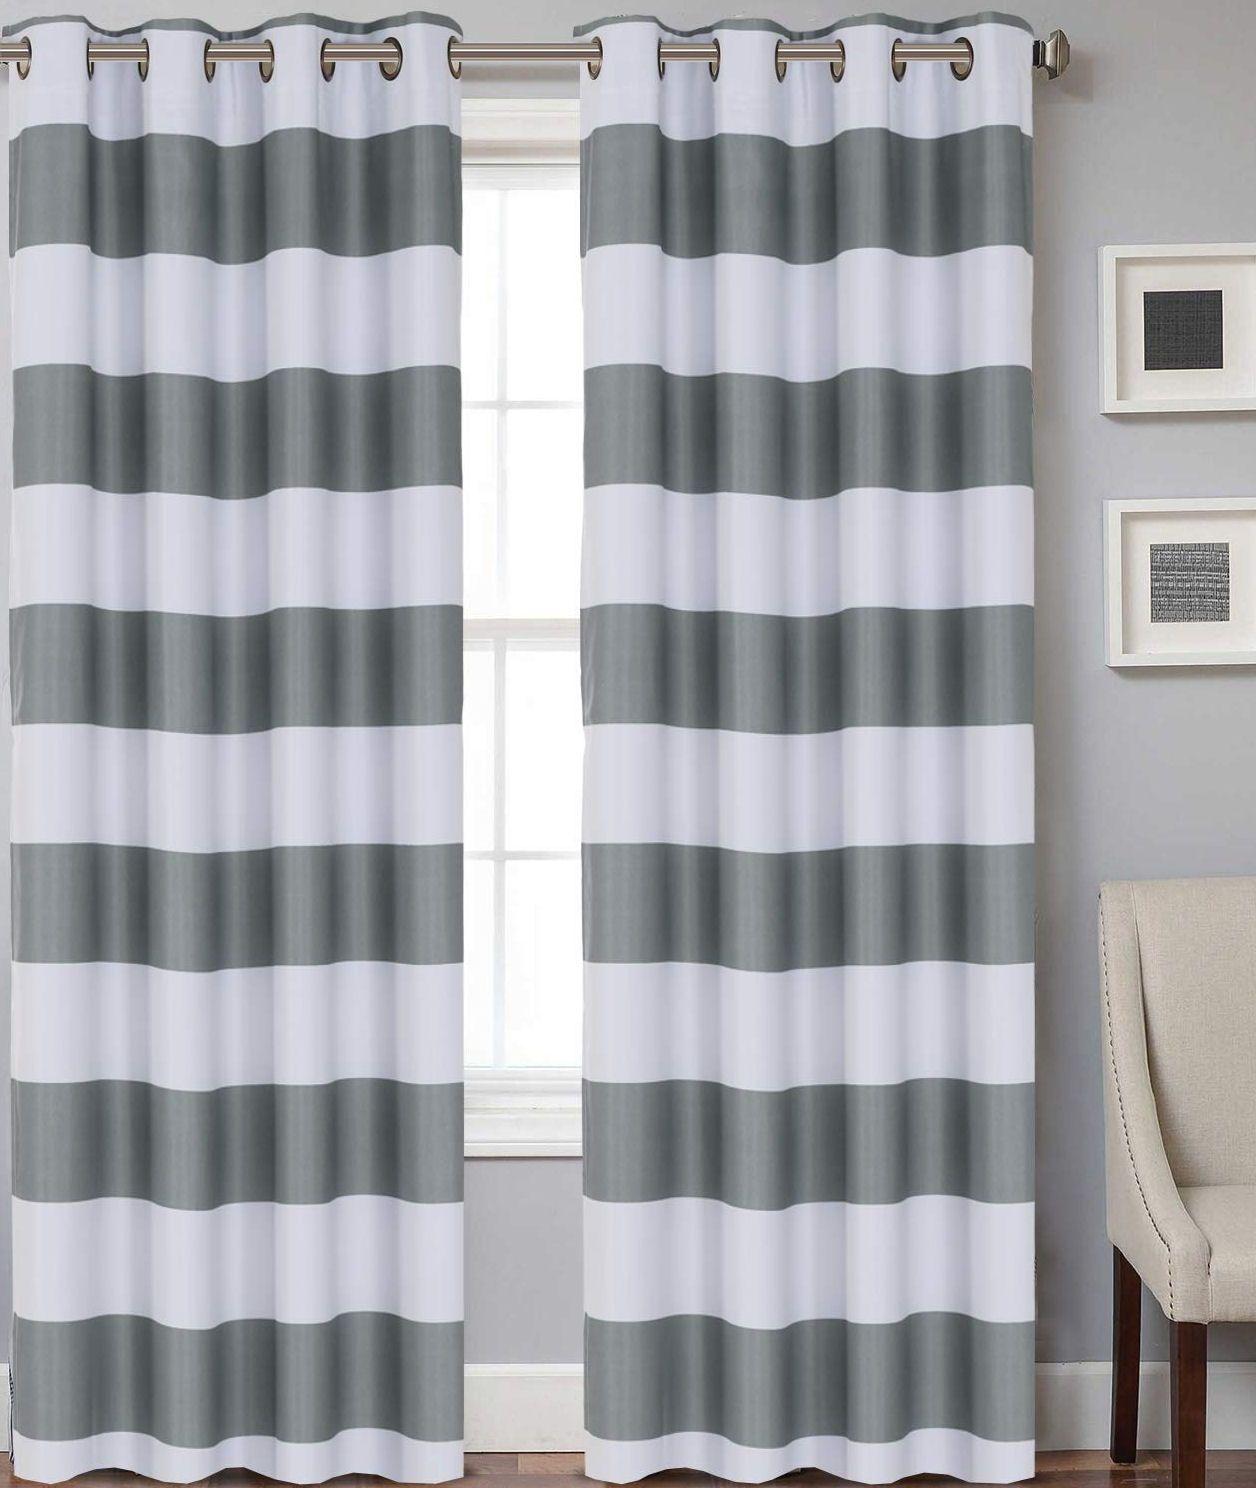 Striped Grommet Blackout Kids Drapes Coastal Bedrooms Curtains Living Room Coastal Living Rooms